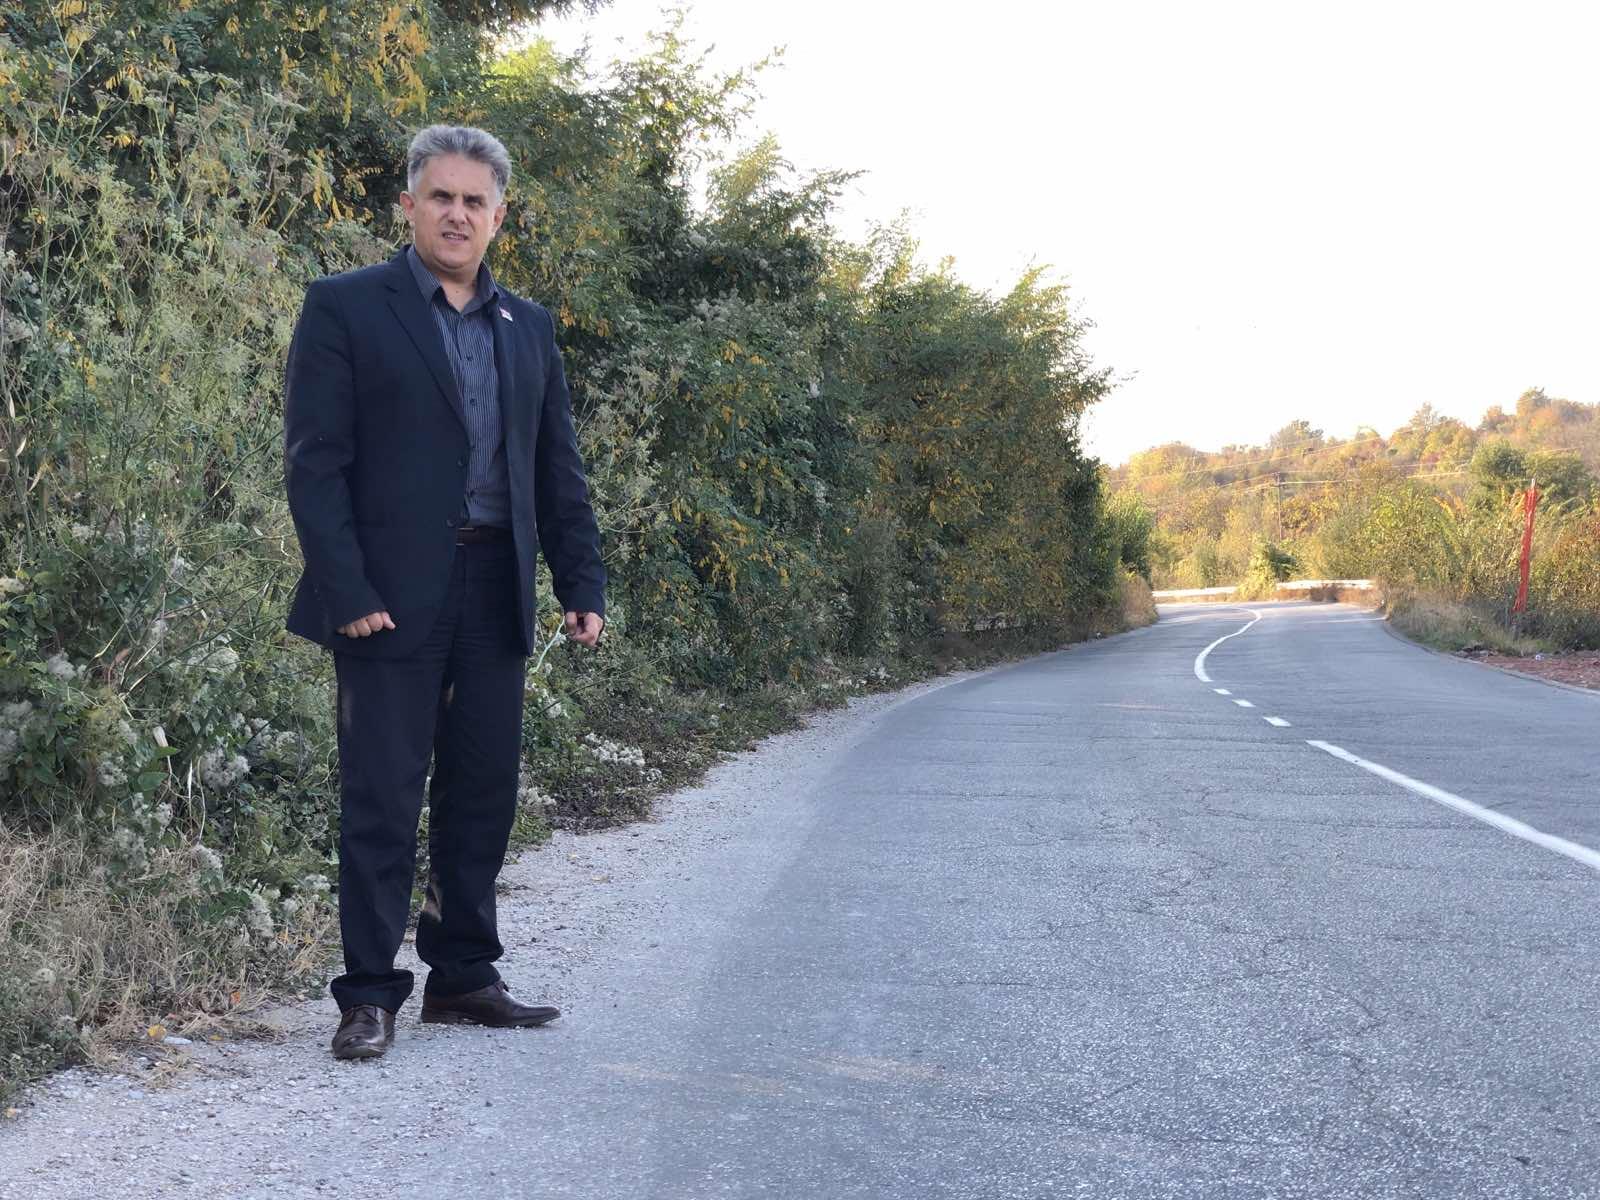 Miletić obilazi saobraćajnicu, foto: M.M.